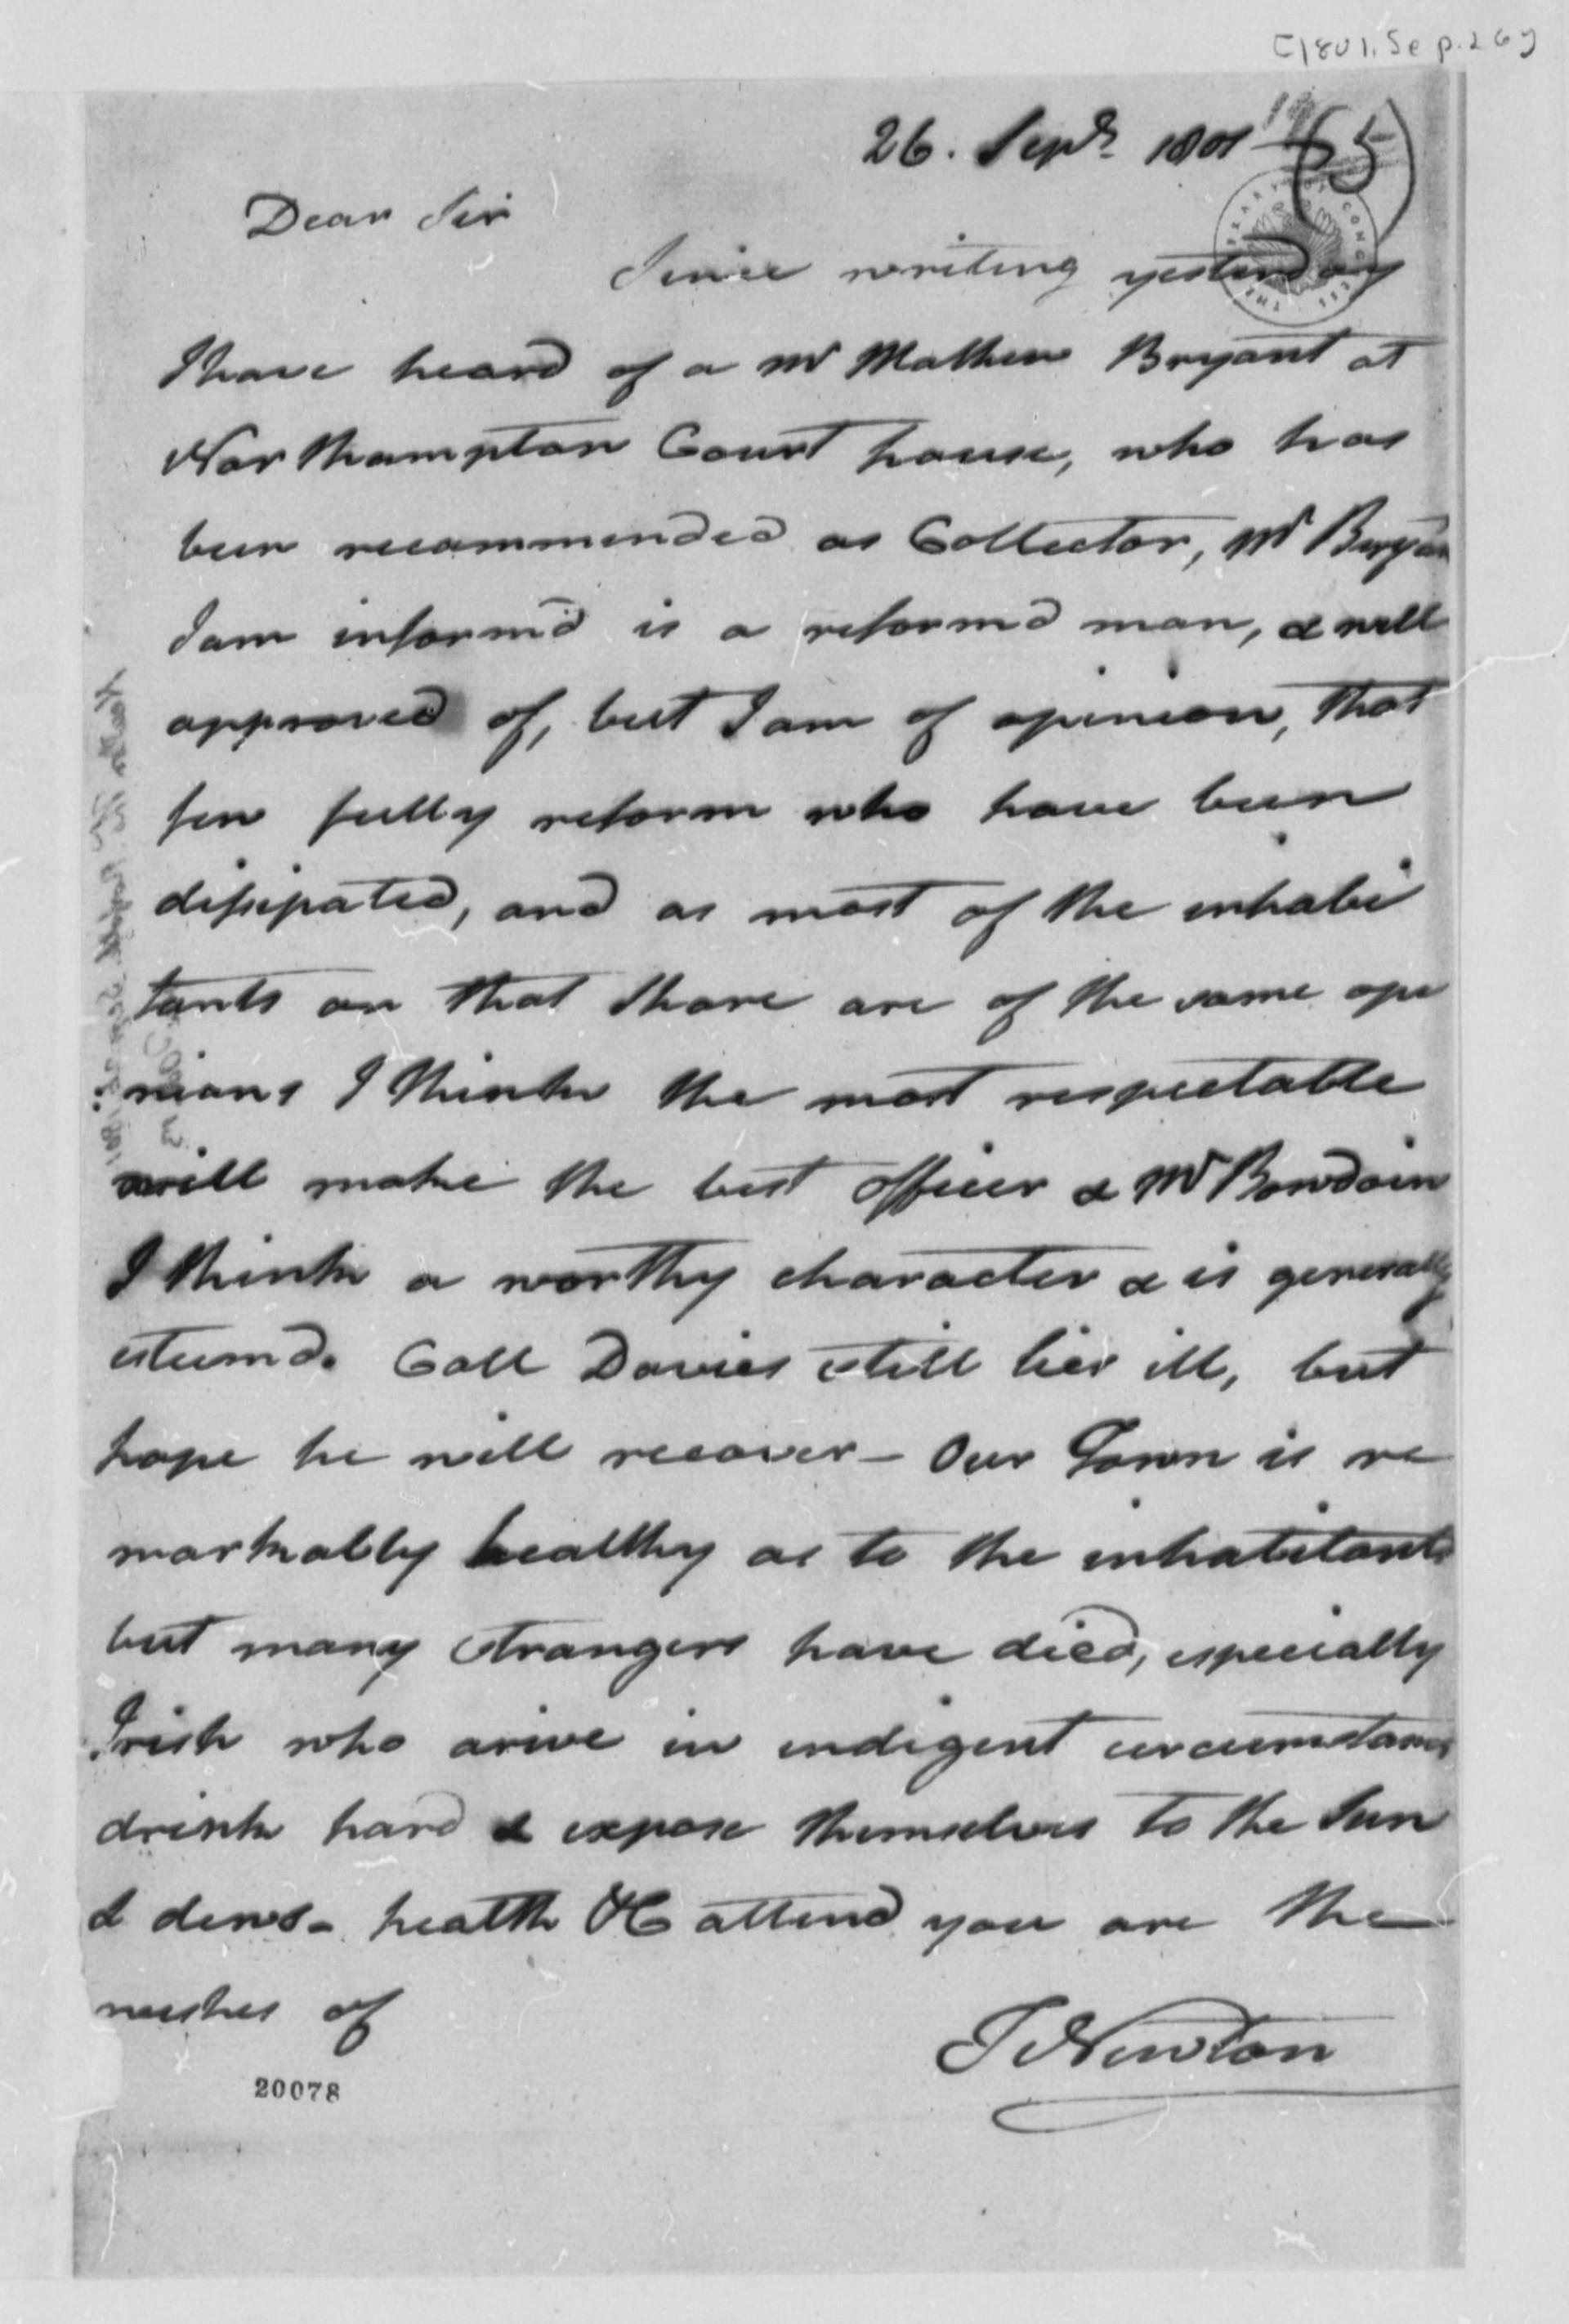 010 Thomas Jefferson Essay Magnificent On Education Questions Outline 1920